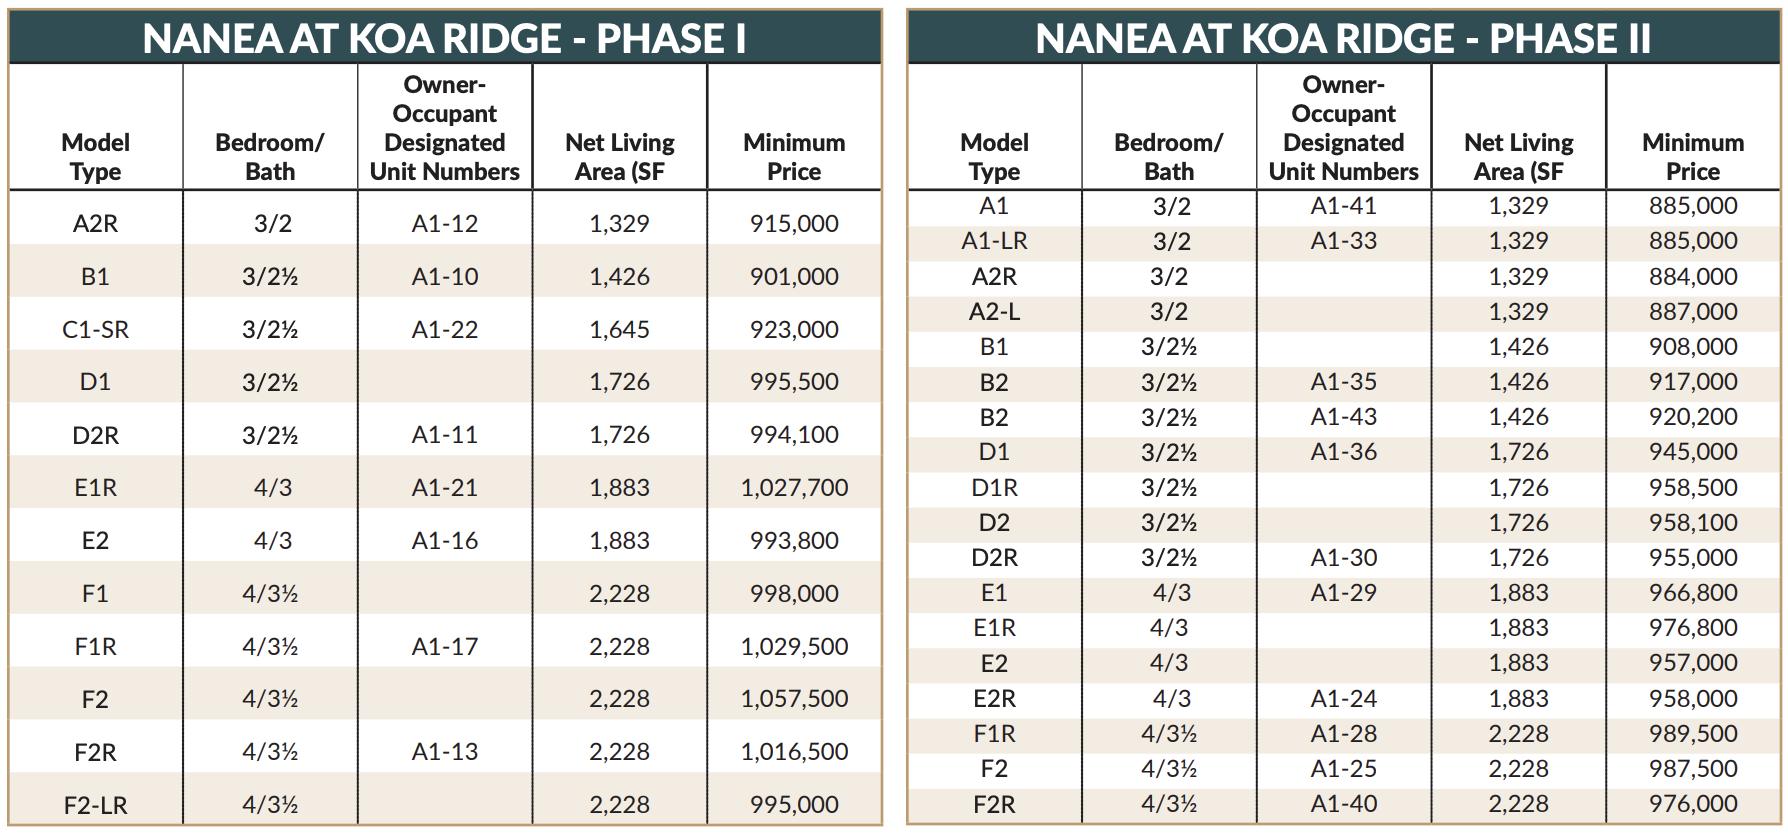 Koa Ridge Price Sheet - Nanea Phase 1 and 2